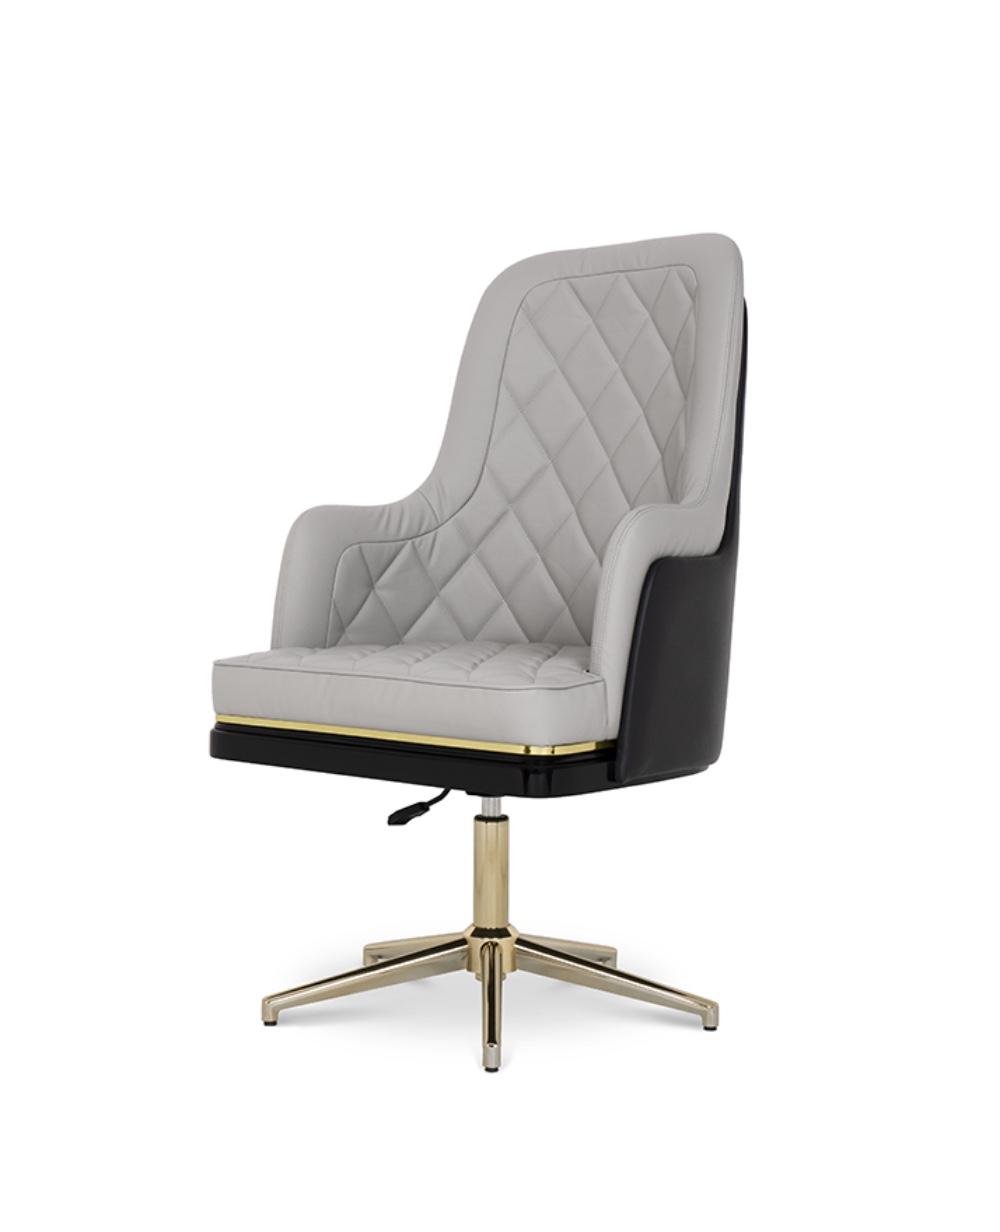 Corporate Office Design Ideas stylish upscale piece, corporate office design ideas Corporate Office Design Ideas Corporate Office Design Ideas stylish upscale piece